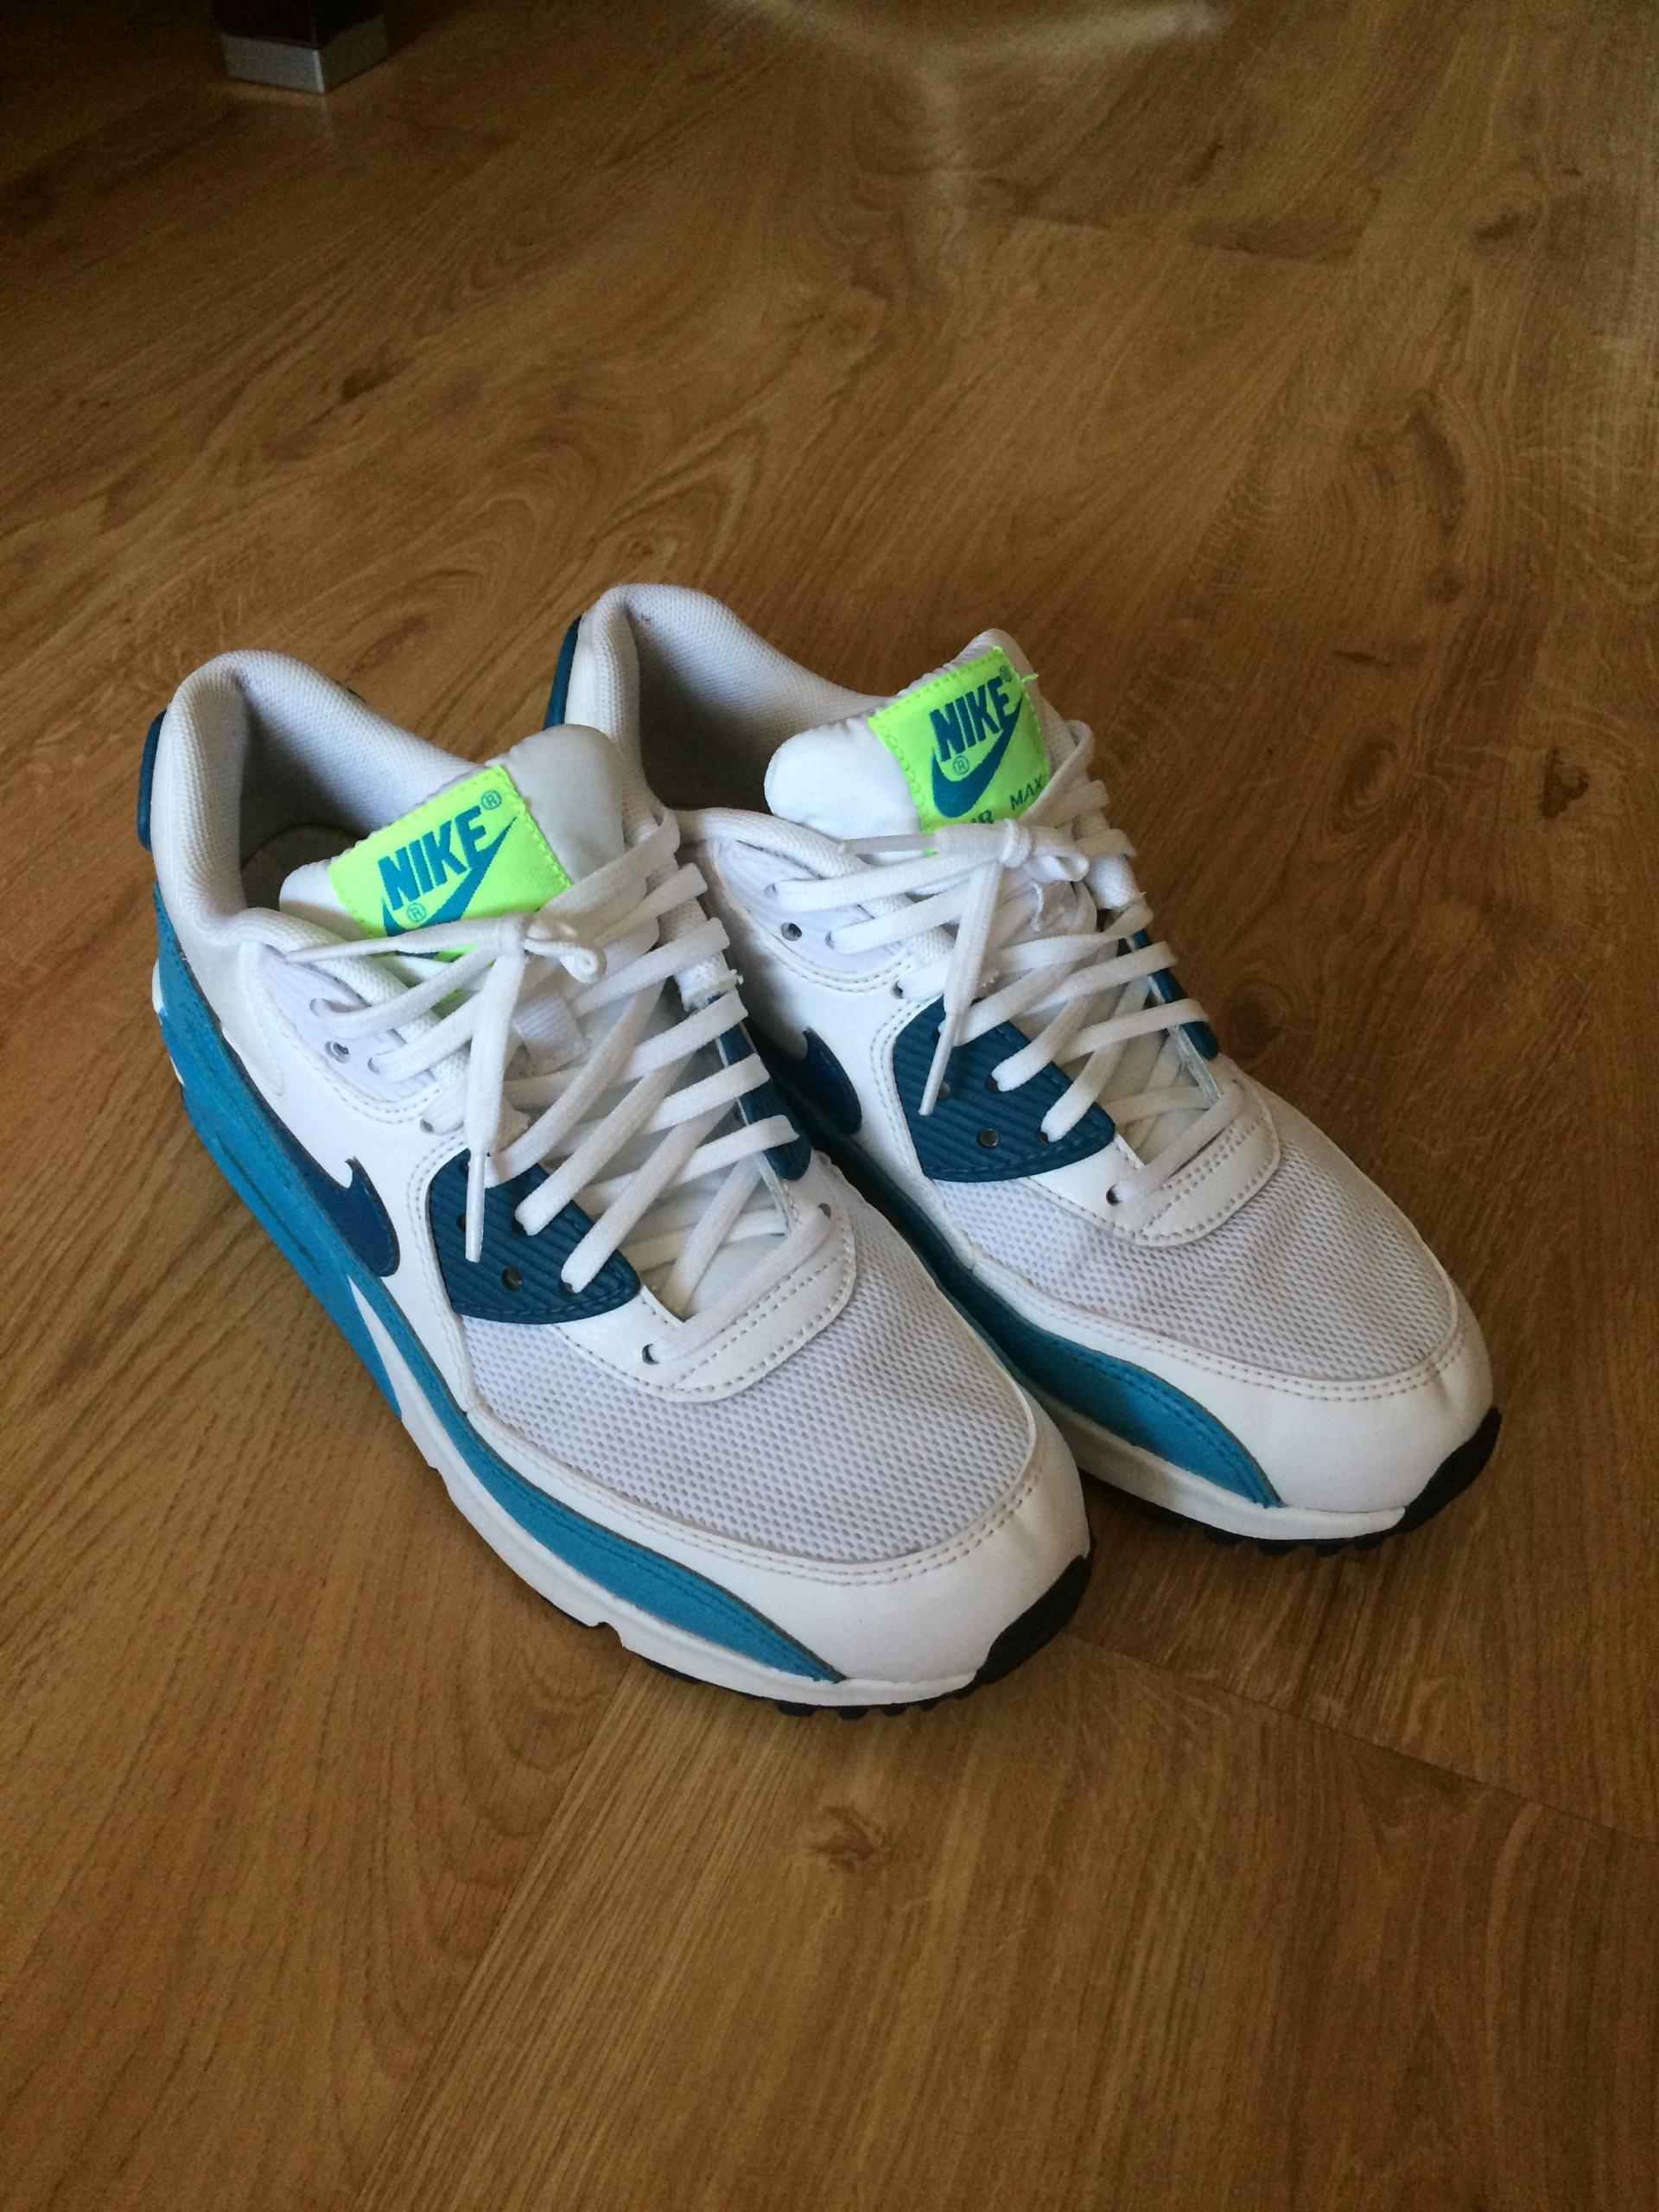 13affc50 Nike Air Max 90 Rozm. 38. Oryginalne!!! - 7197946354 - oficjalne archiwum  allegro